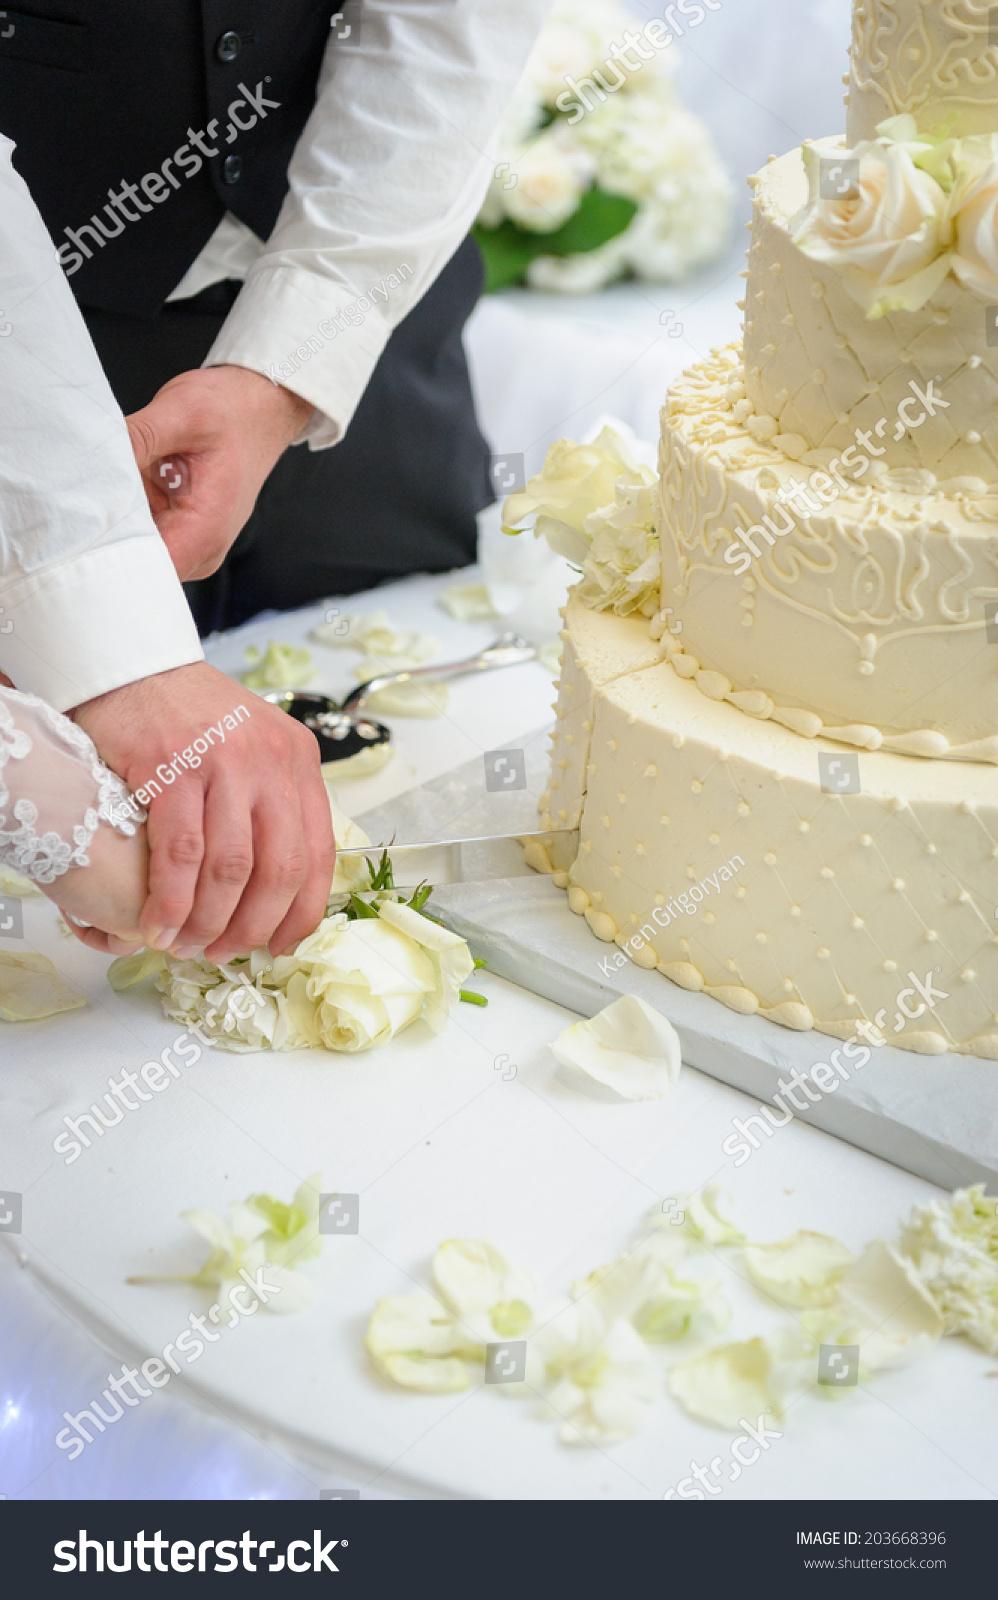 cutting wedding cake stock photo 203668396 shutterstock. Black Bedroom Furniture Sets. Home Design Ideas